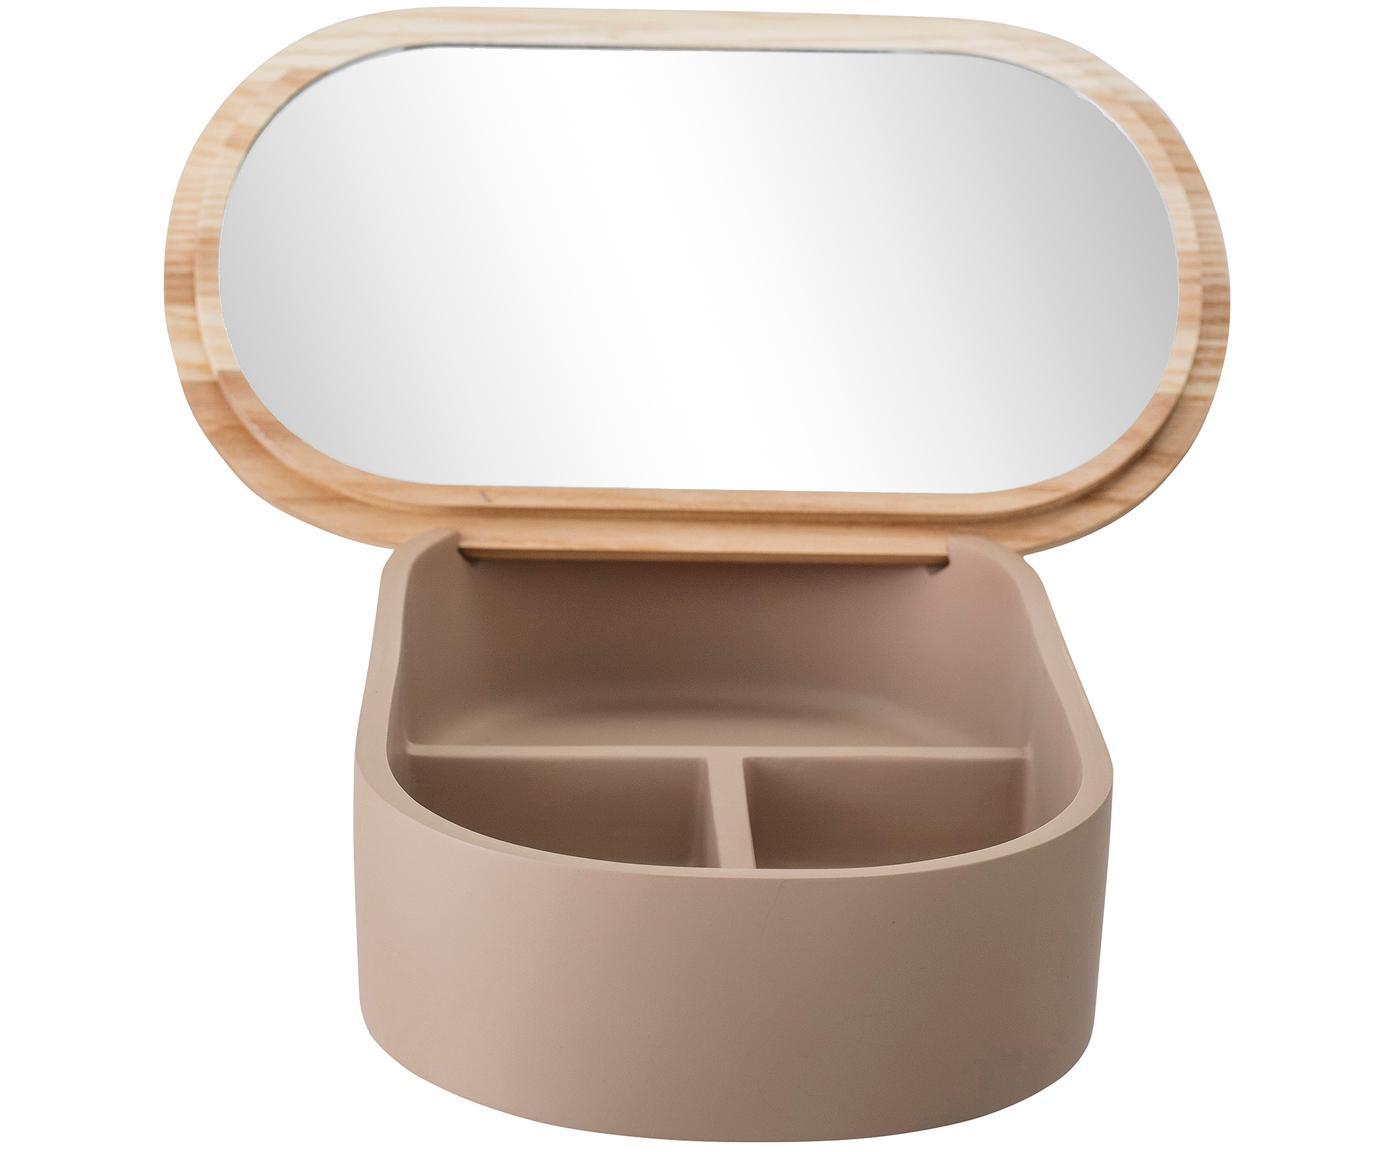 Schmuckbox Noah, Box: Polyresin, Deckel: Eschenholz, Altrosa, Eschenholz , Spiegelglas, 23 x 6 cm